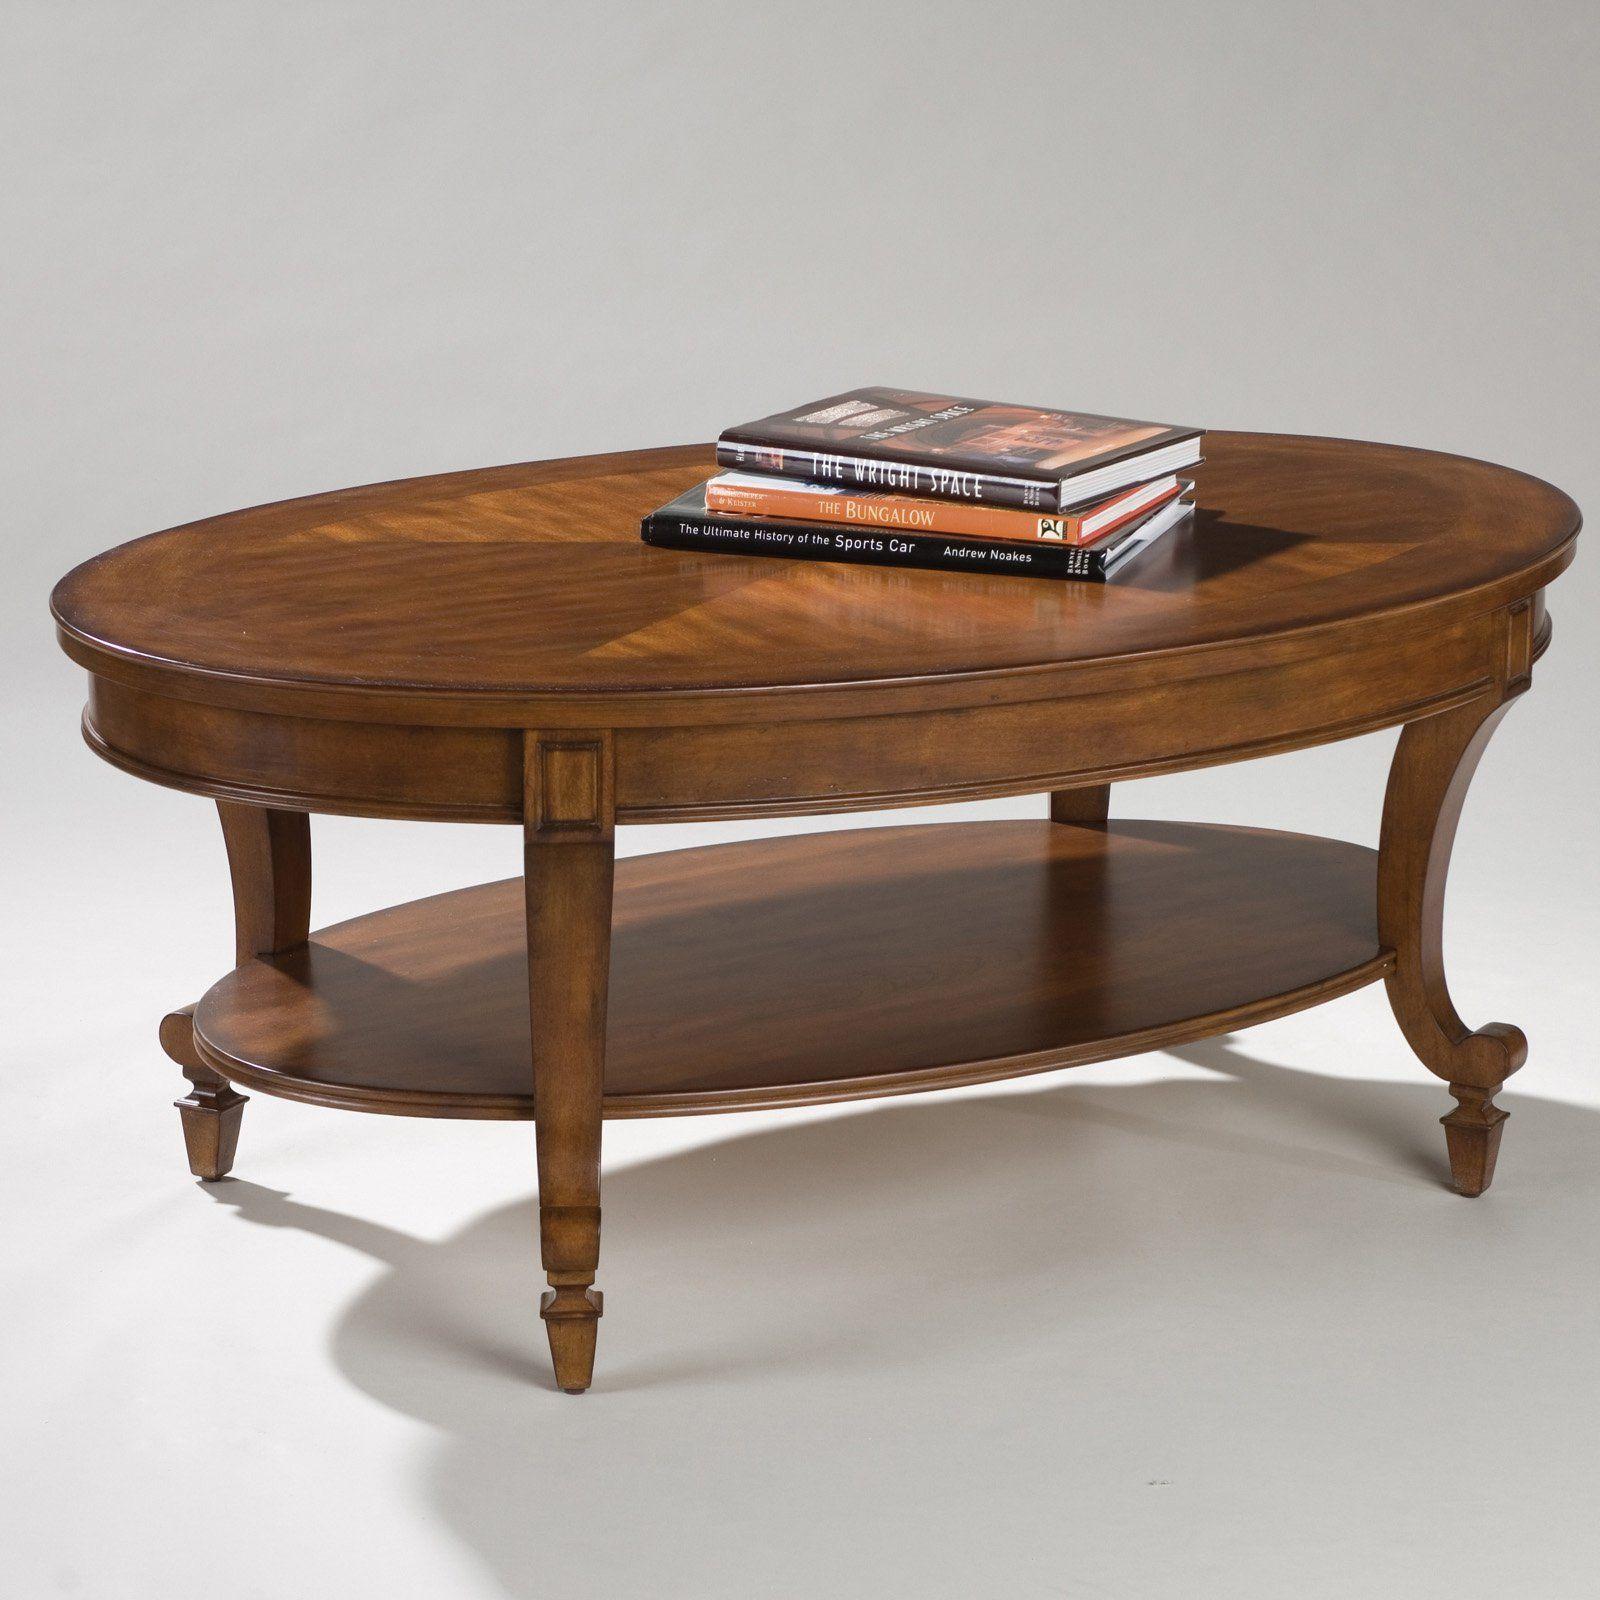 Magnussen T1052 Aidan Wood Oval Coffee Table In 2021 Oval Coffee Tables Traditional Coffee Table Round Wood Coffee Table [ 1600 x 1600 Pixel ]